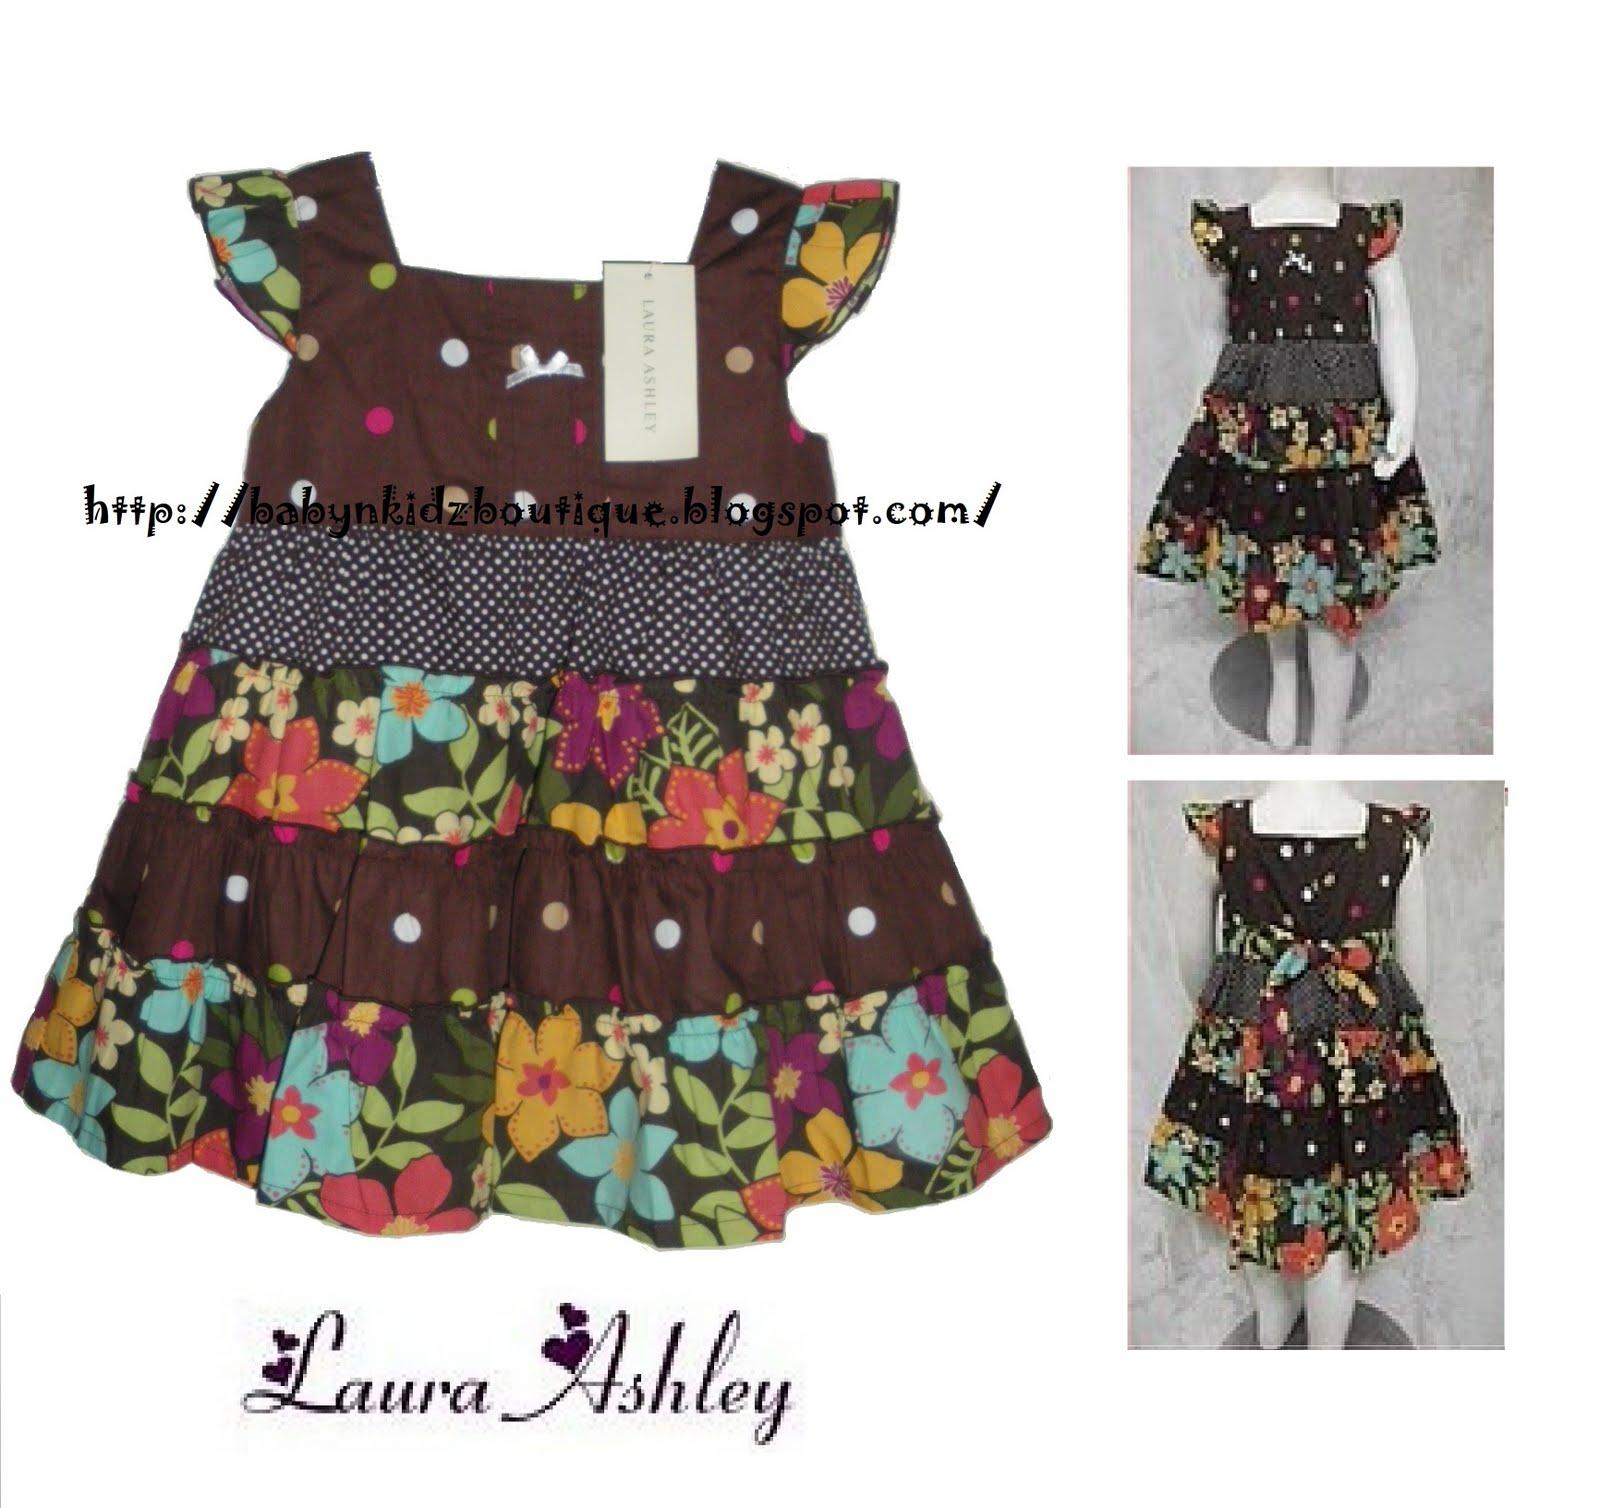 http://2.bp.blogspot.com/_InHmHDRFgE0/TGSQRuRJiTI/AAAAAAAAANw/ZN1vG-FSEq0/s1600/Modern+Layers+Gown+TM.jpg